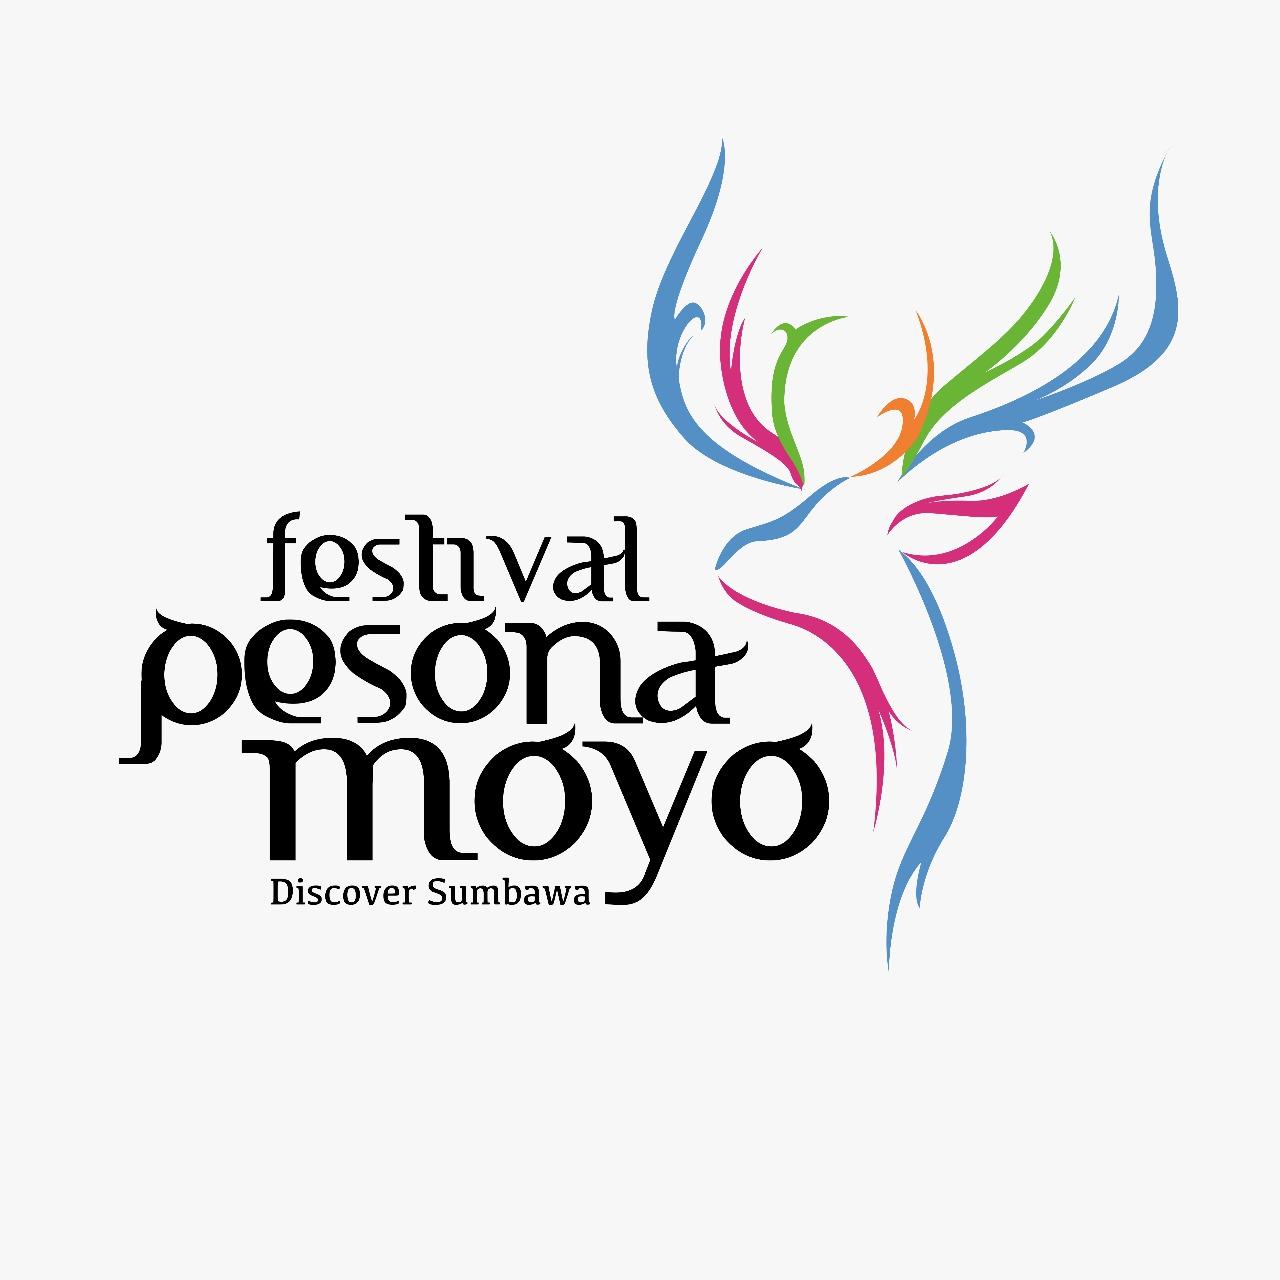 Photo of Festival Pesona Moyo 2018 Dijamin Bikin Ketagihan